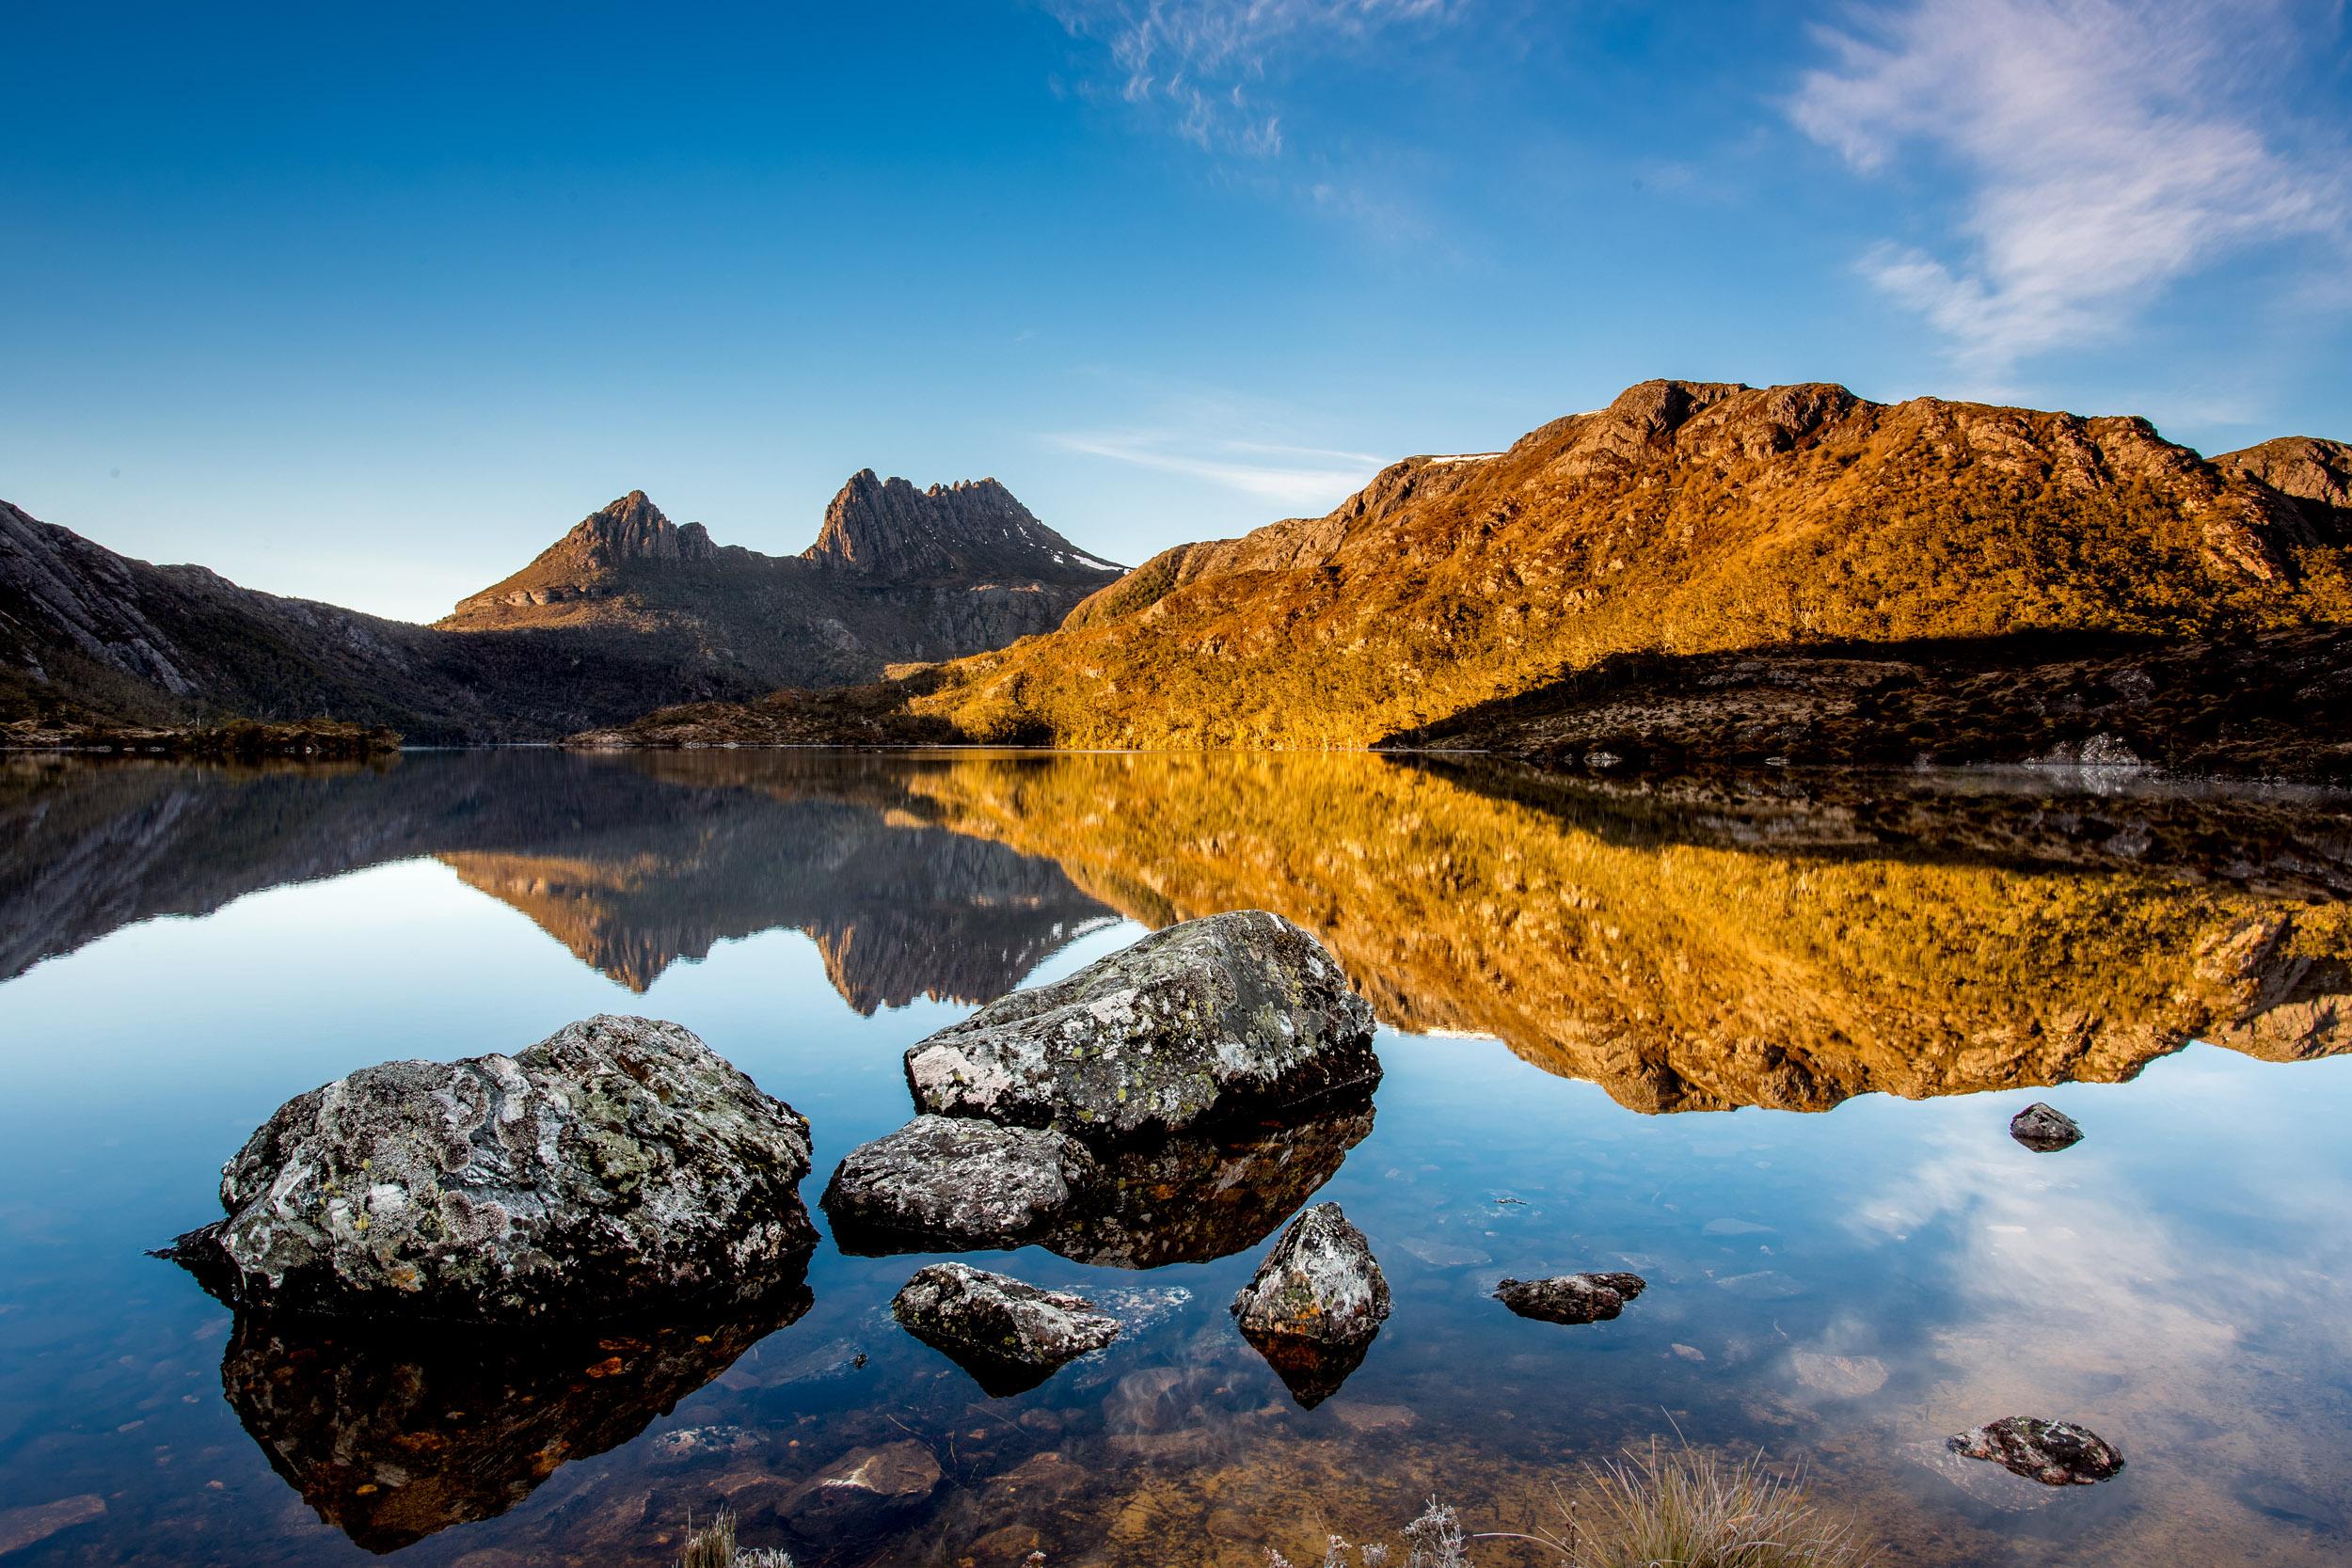 cradle-mountain-glass-tasmania.jpg